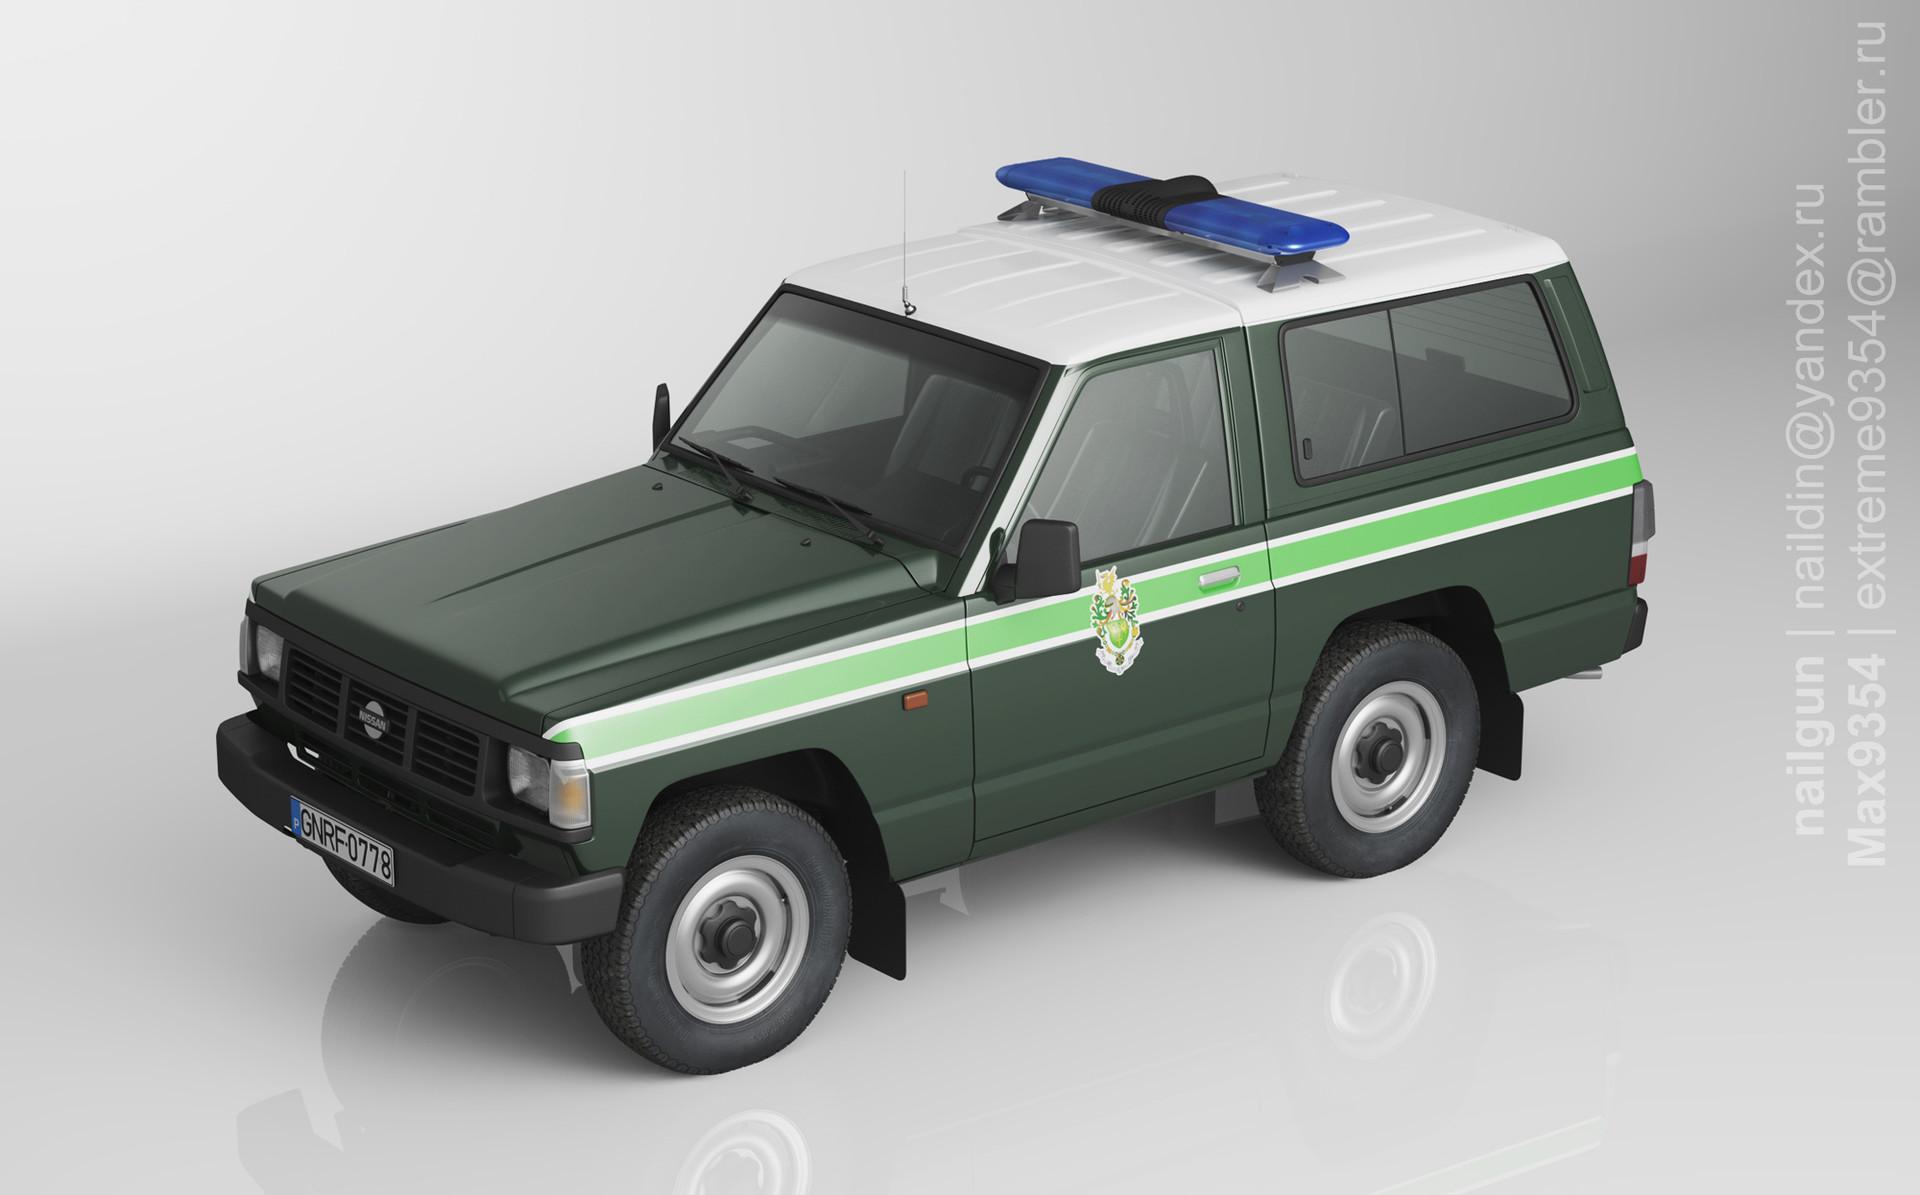 Nail khusnutdinov pwc 054 000 nissan patrol miniature